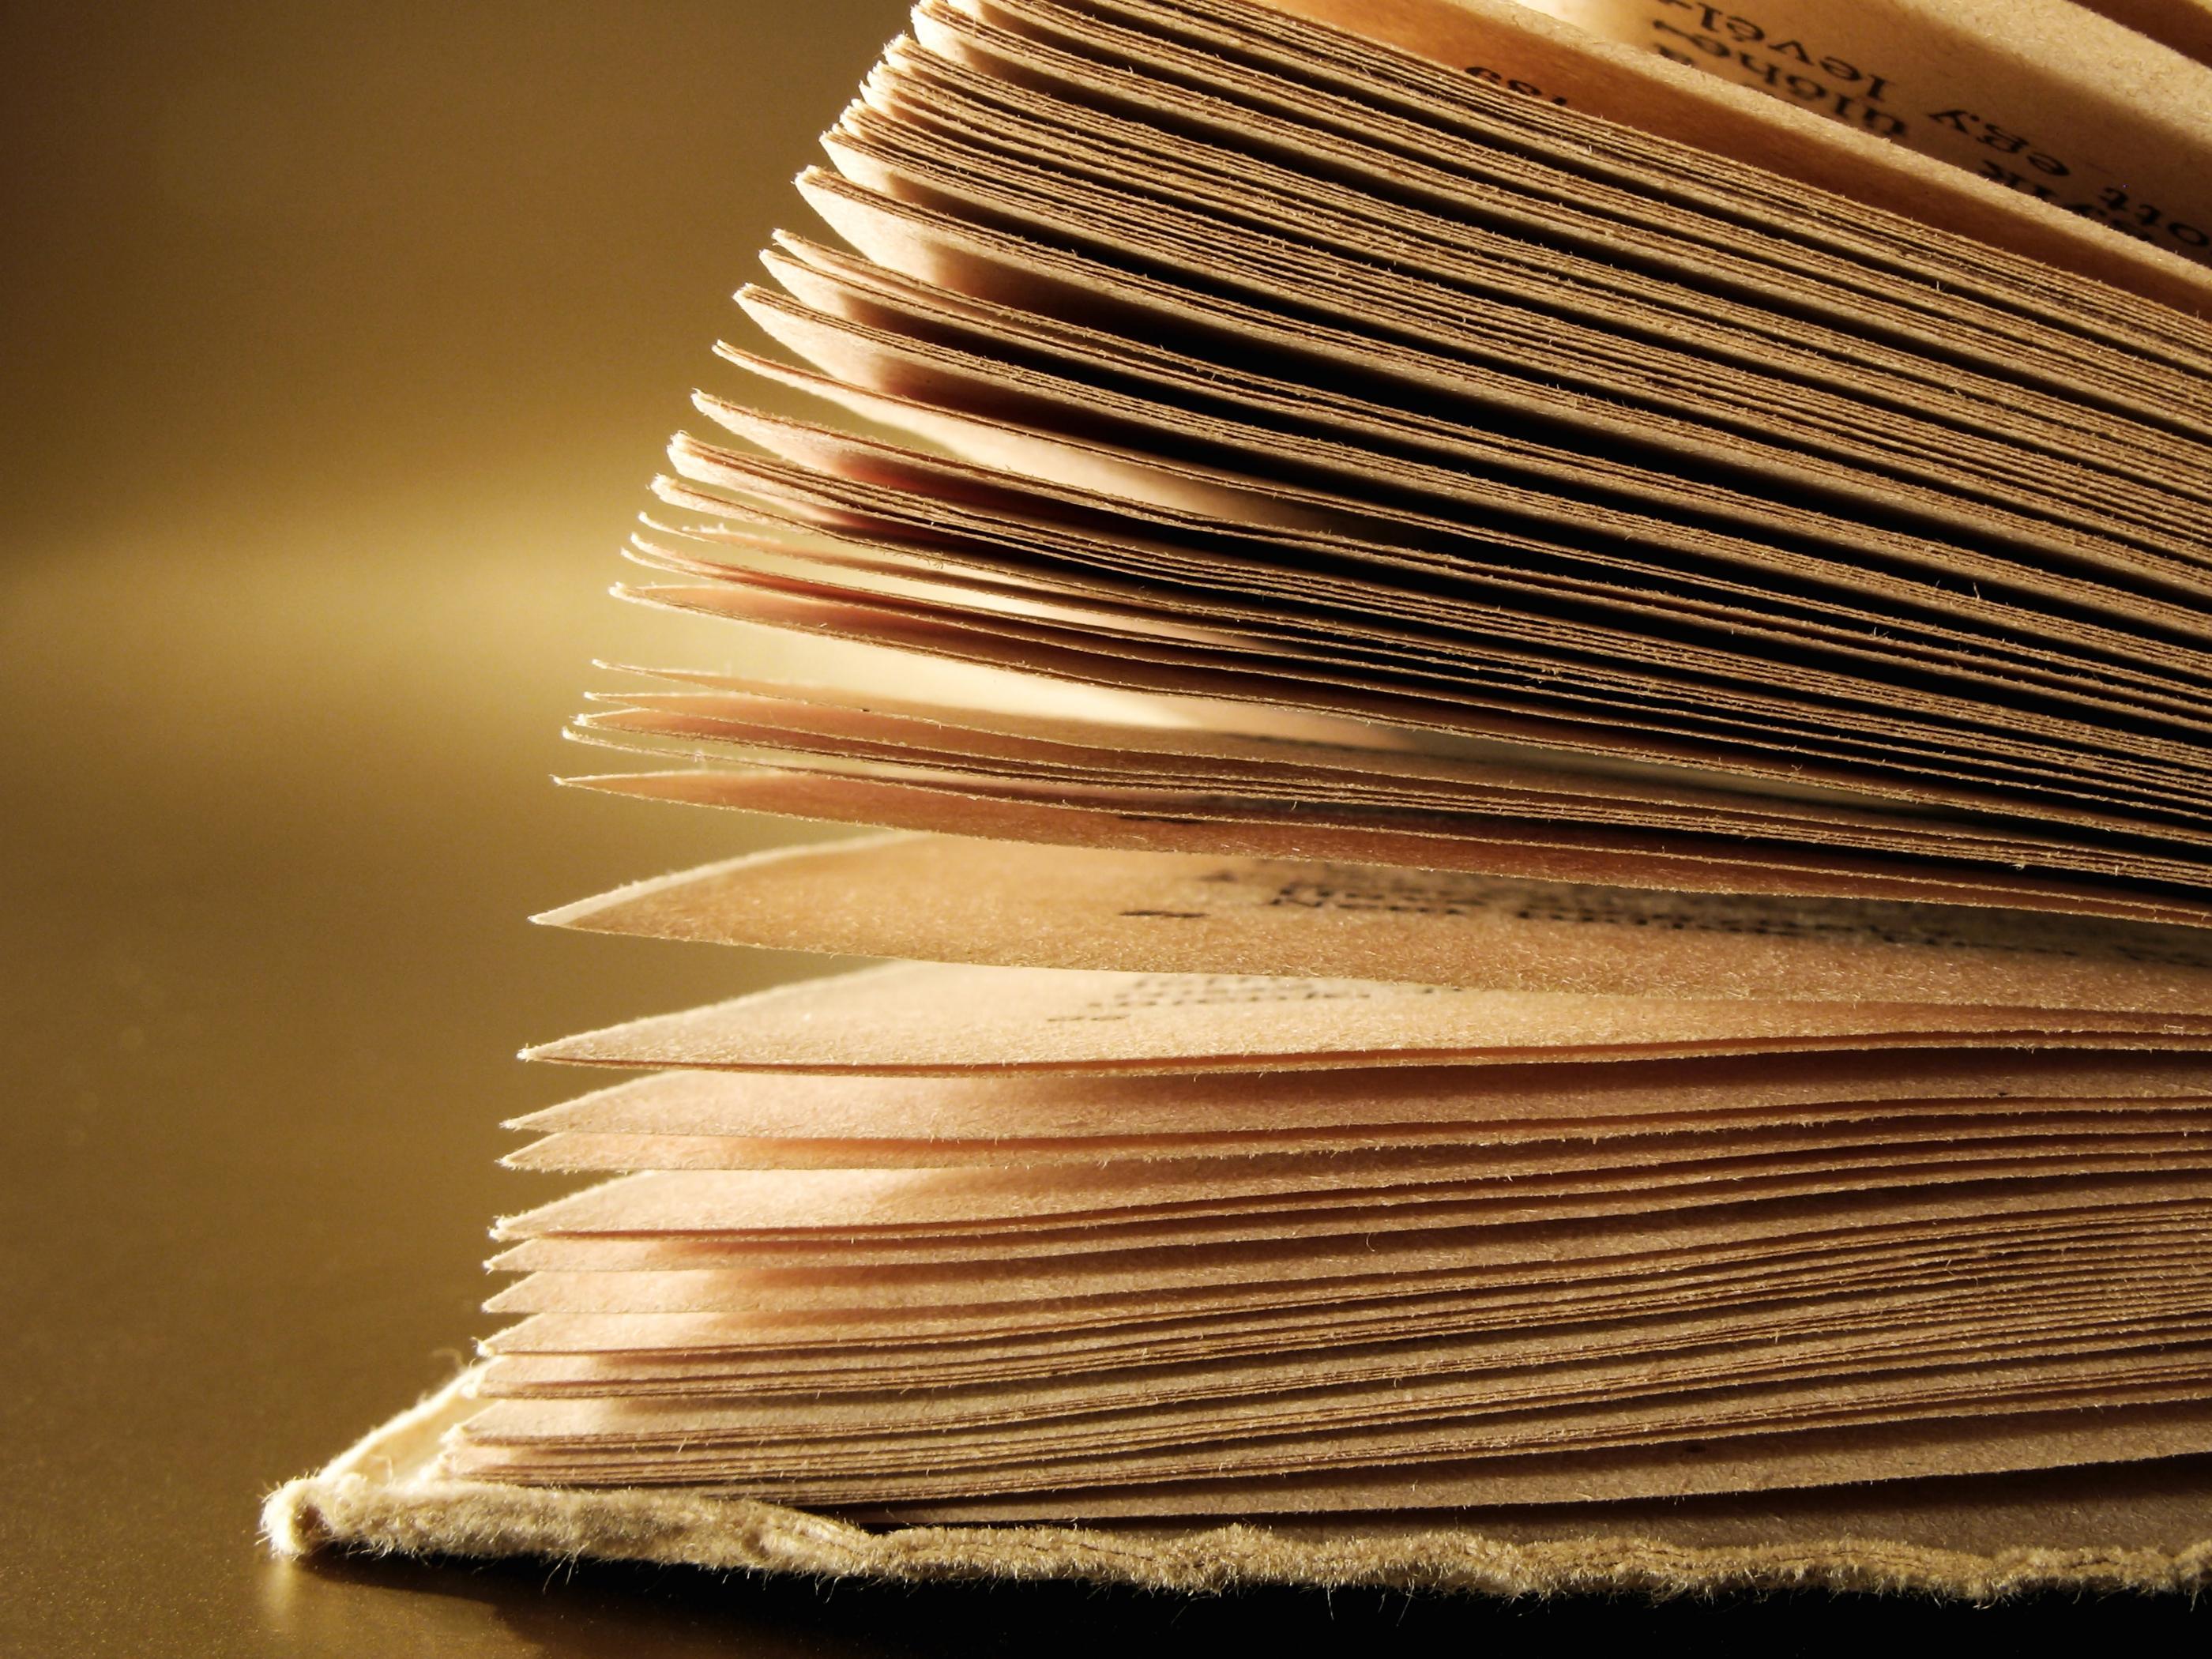 Miercoles de lectura! Lista de lectura!